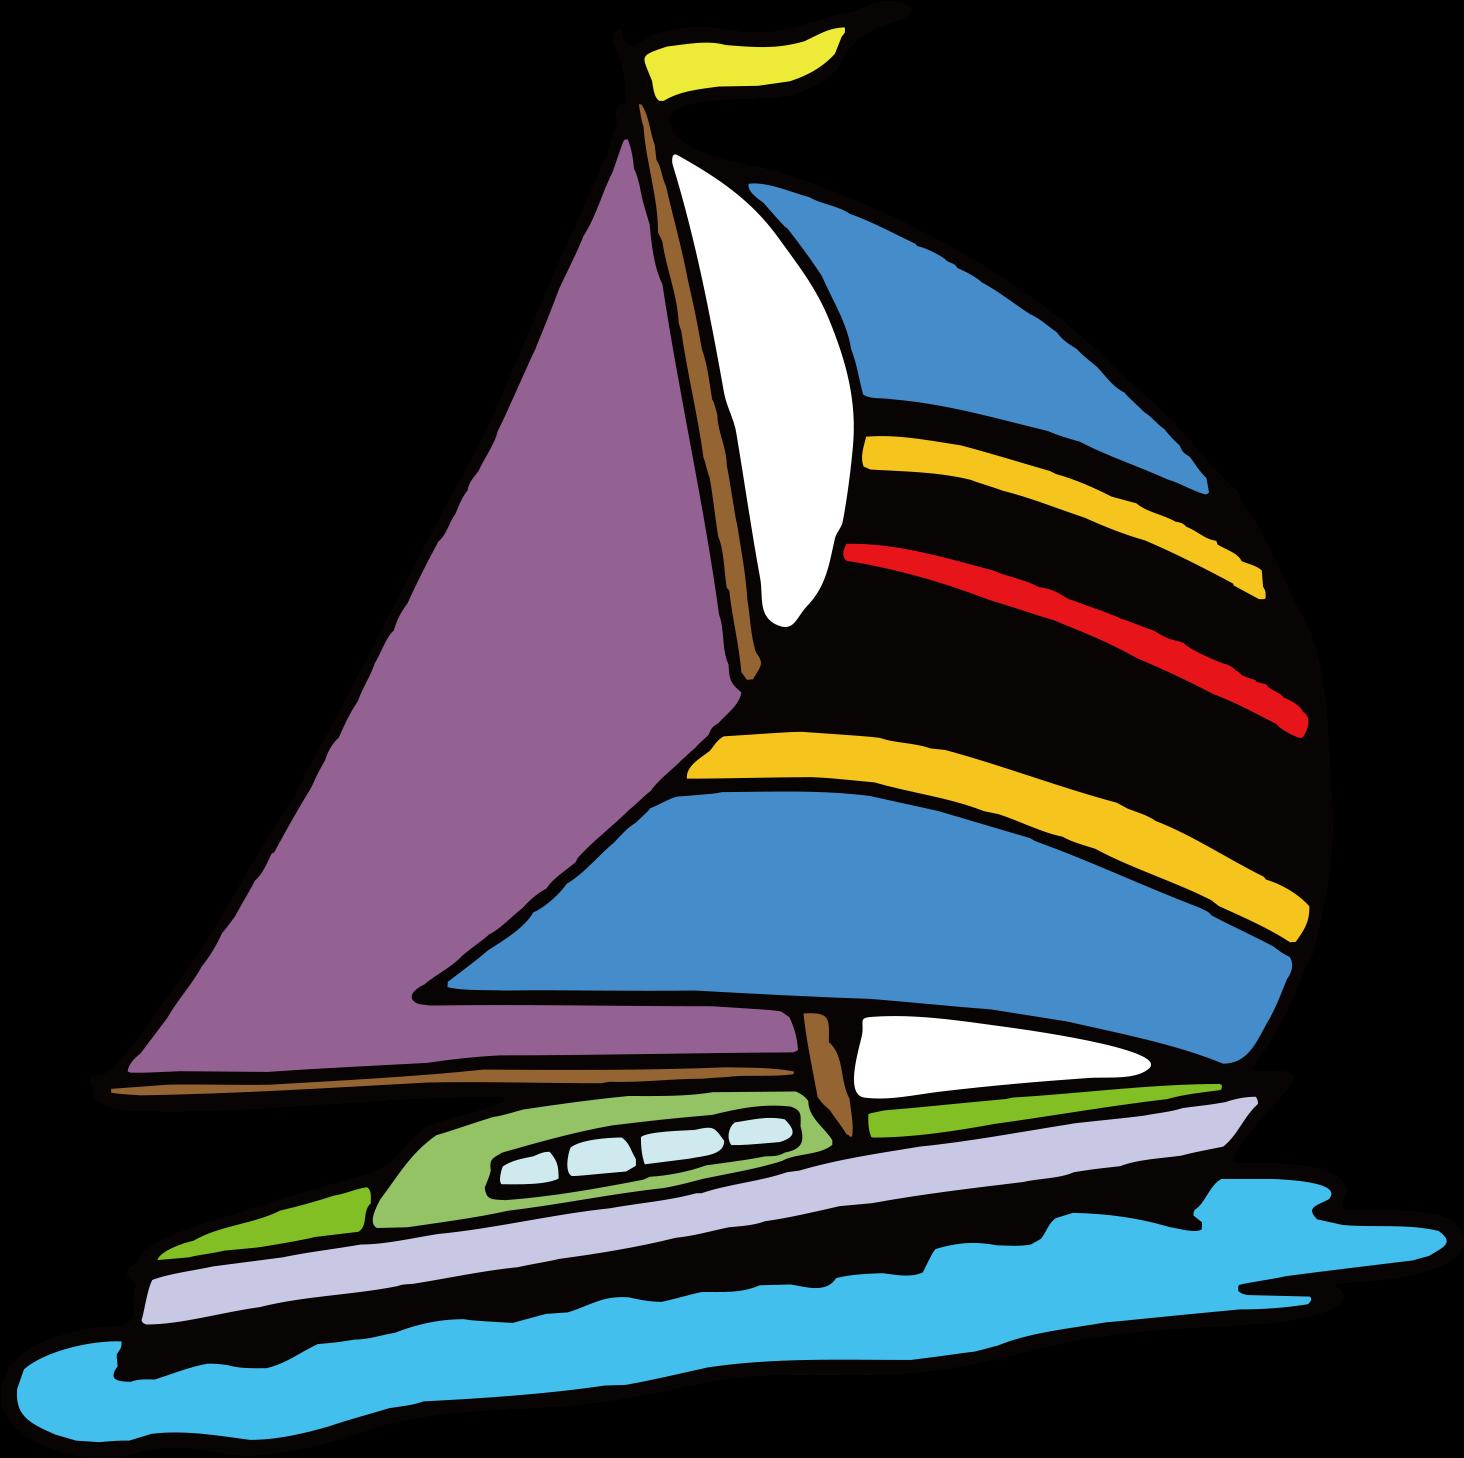 Sailing Ship Clip Art   Sail Cartoon   Png Download   Full Size ...